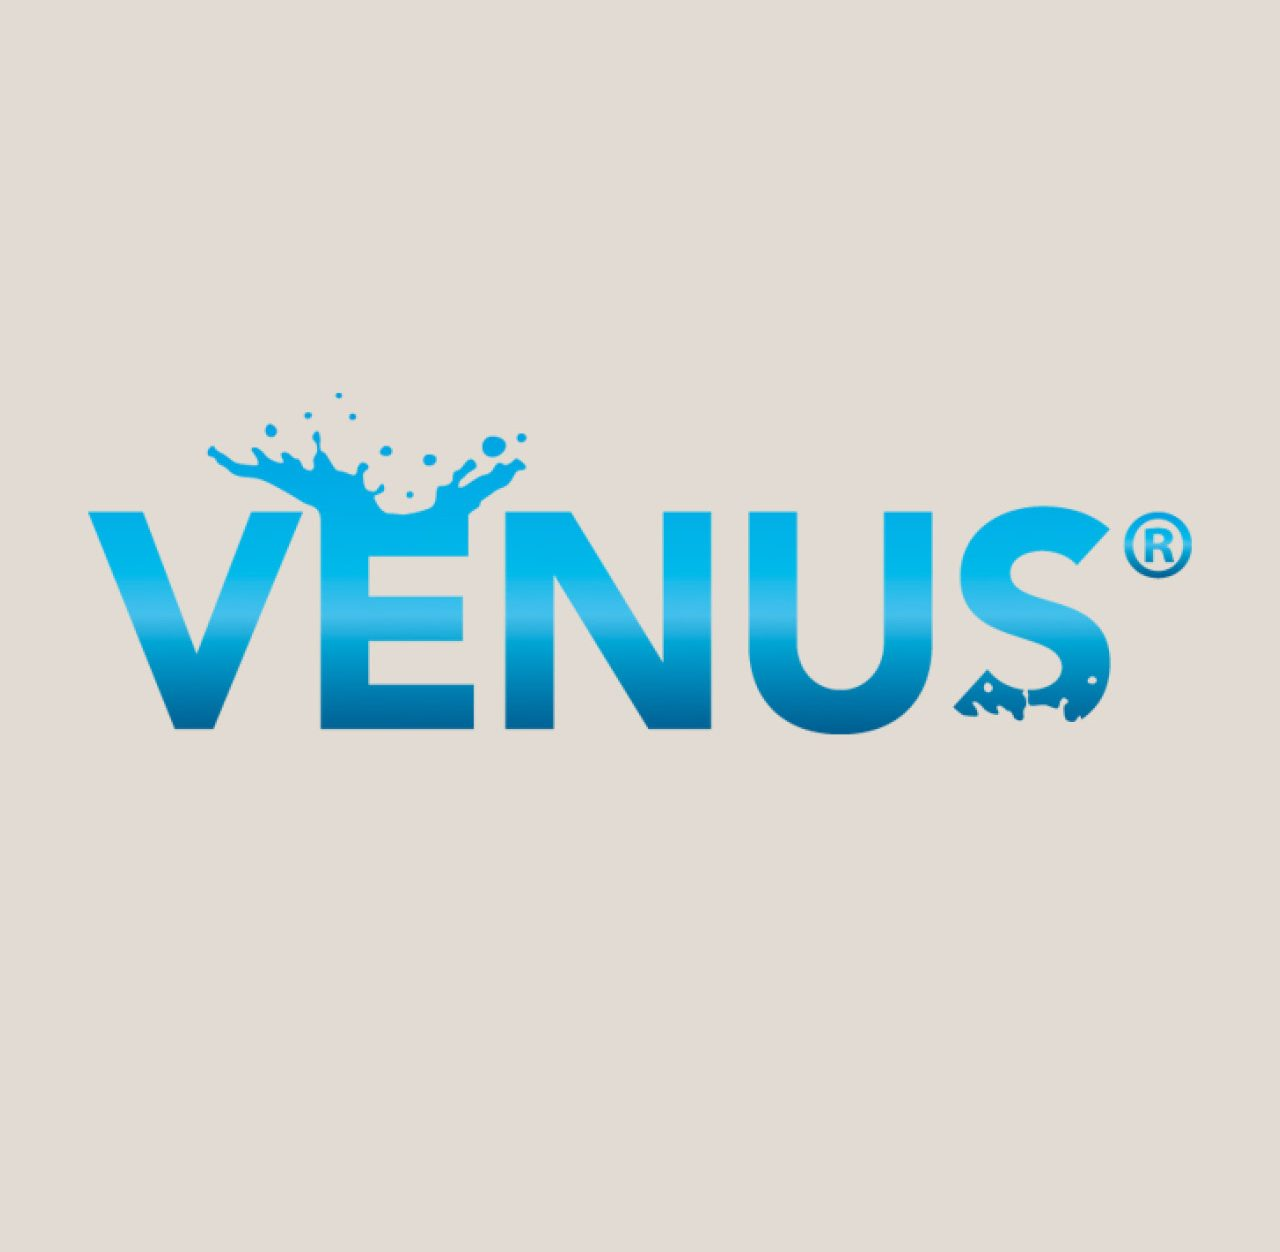 venus_1280x1280